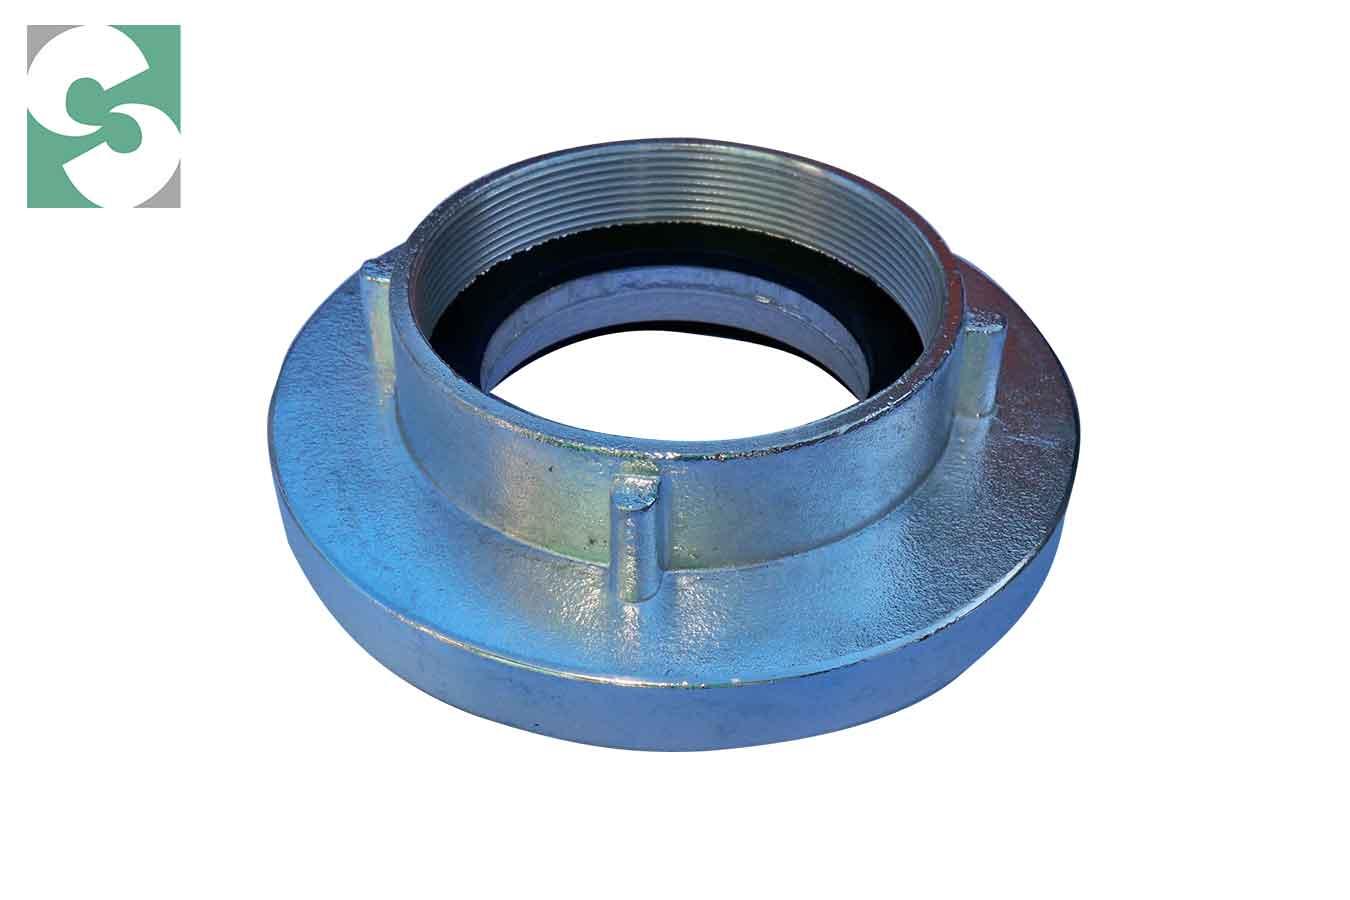 Acople Storz Aluminio Tuerca